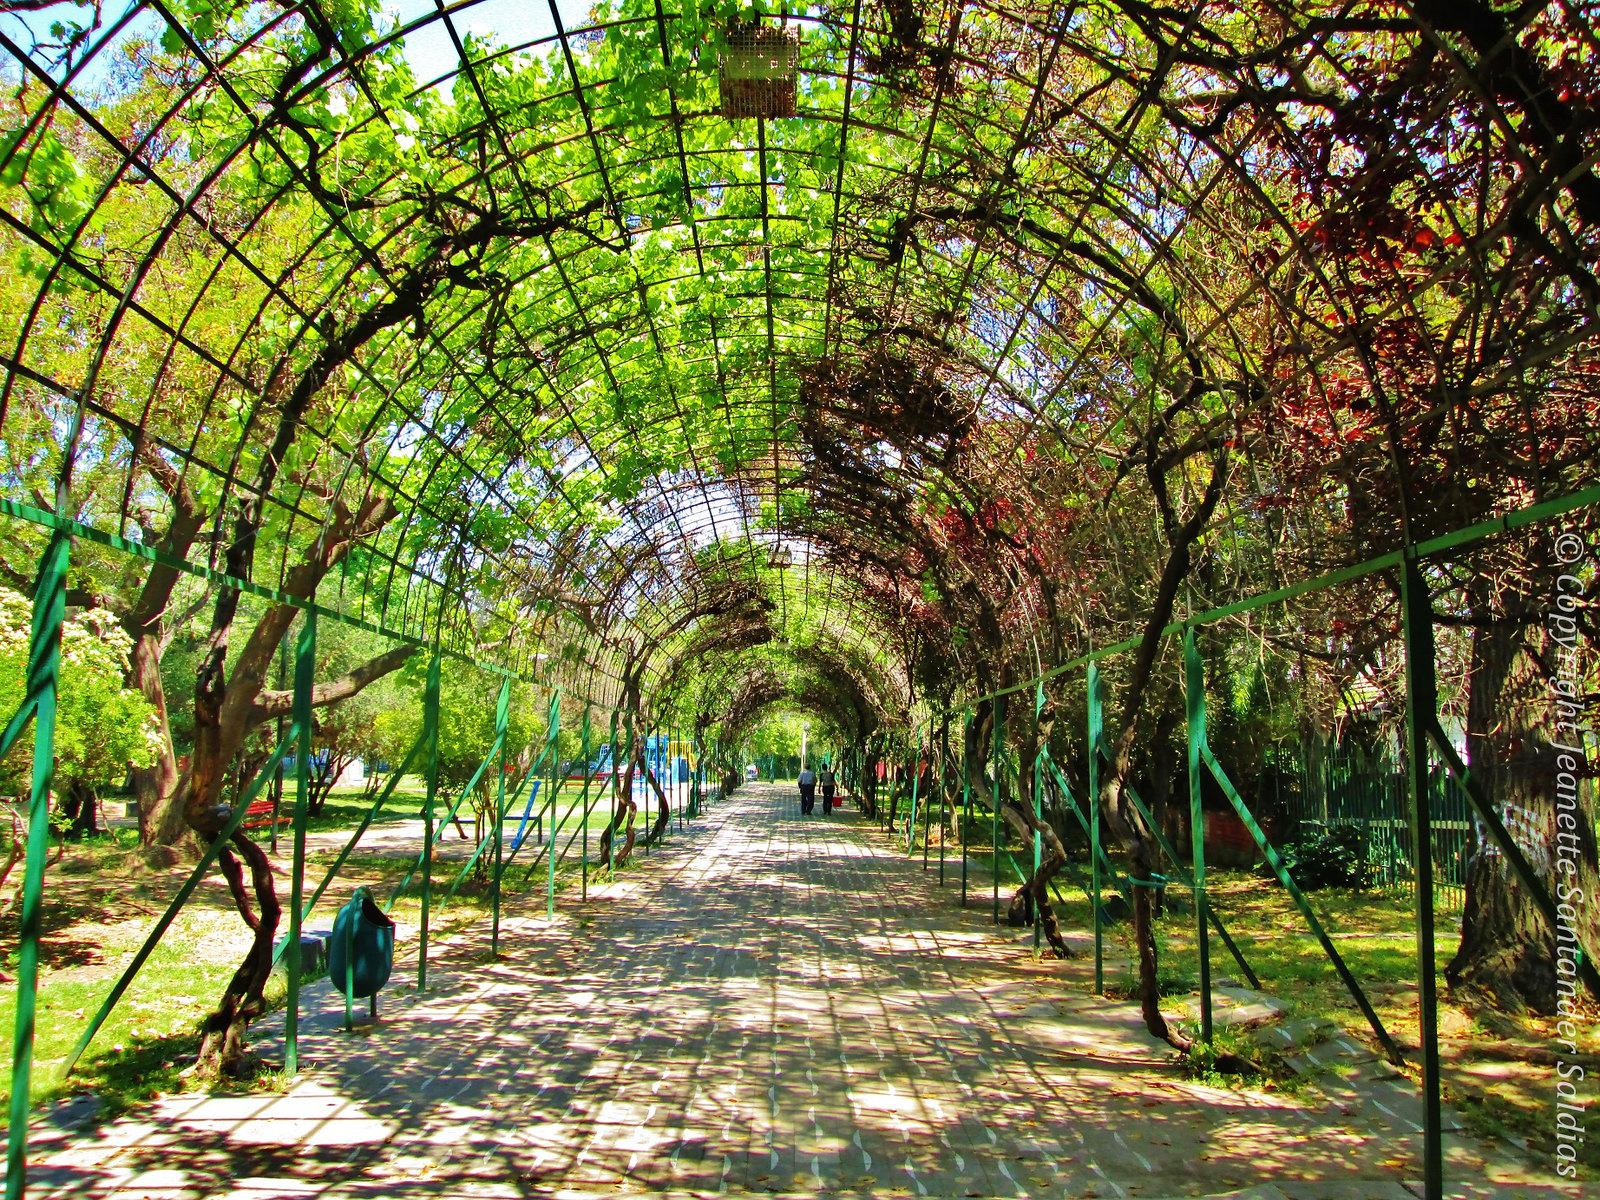 Plant Tunel, Park Juan XXIII, Santiago Chile (Parque Juan XXIII, Túnel Vegetal)